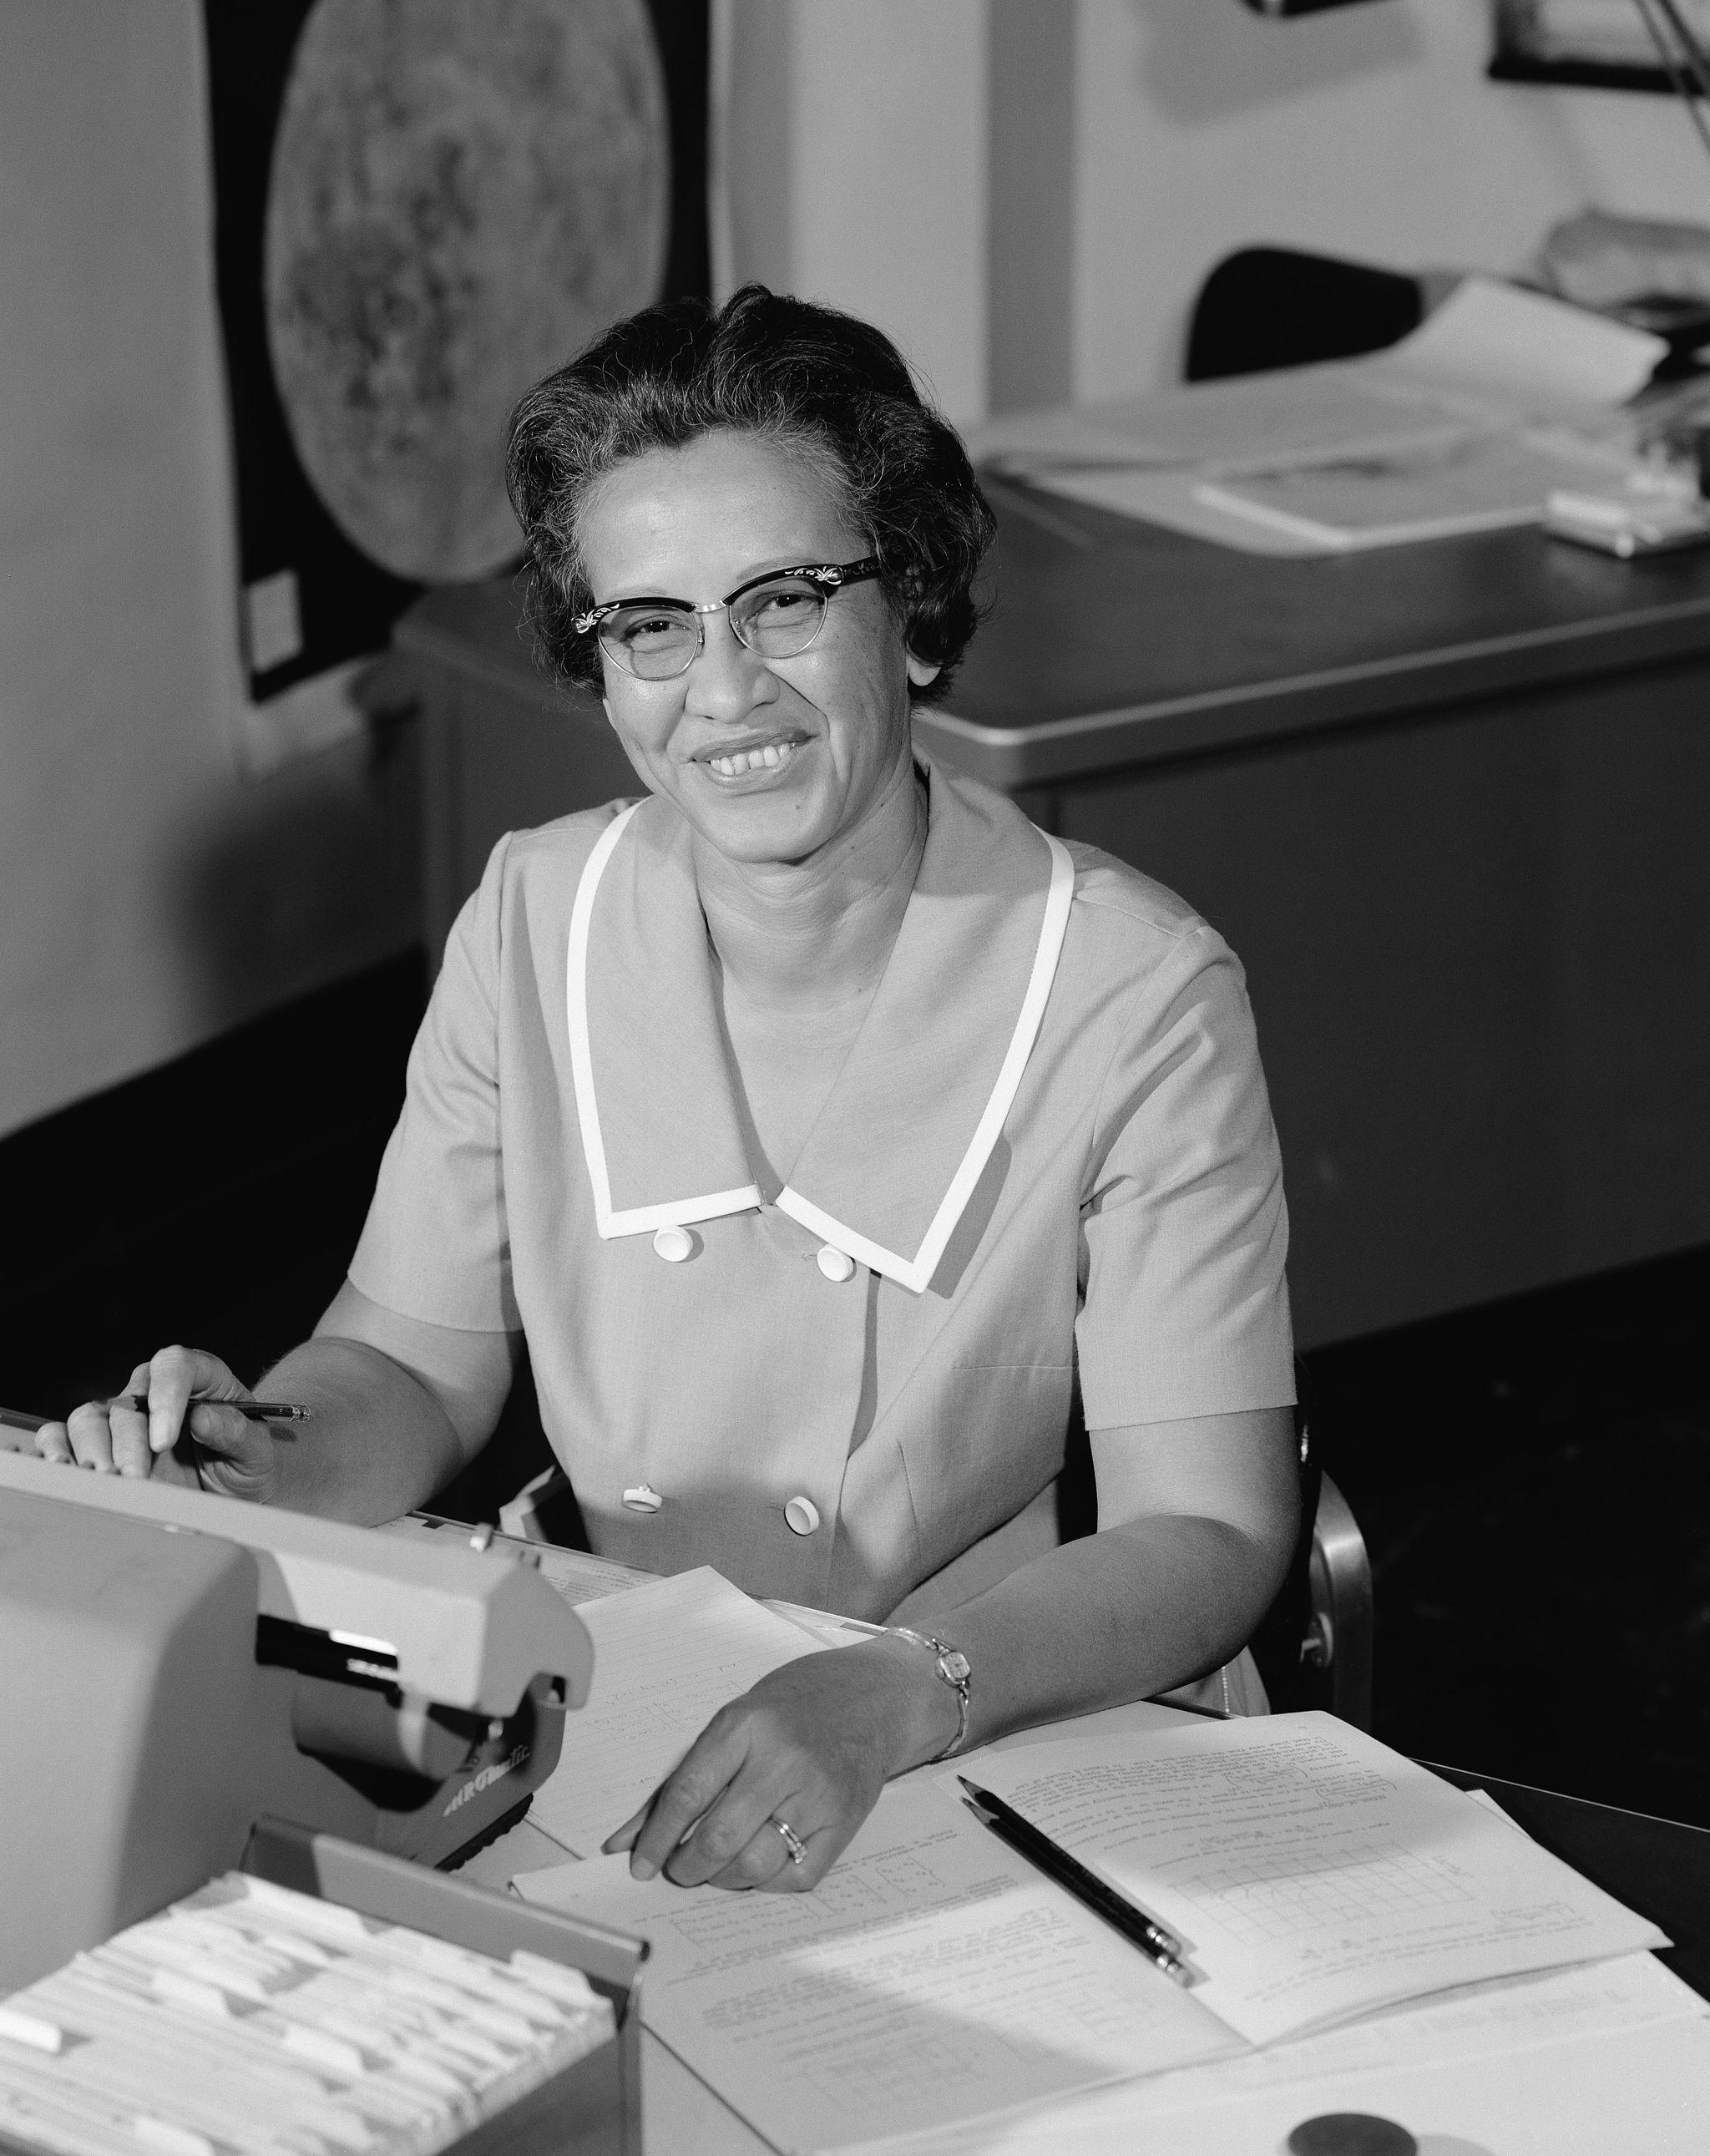 Katherine Johnson smiles while sitting at her desk at NASA.